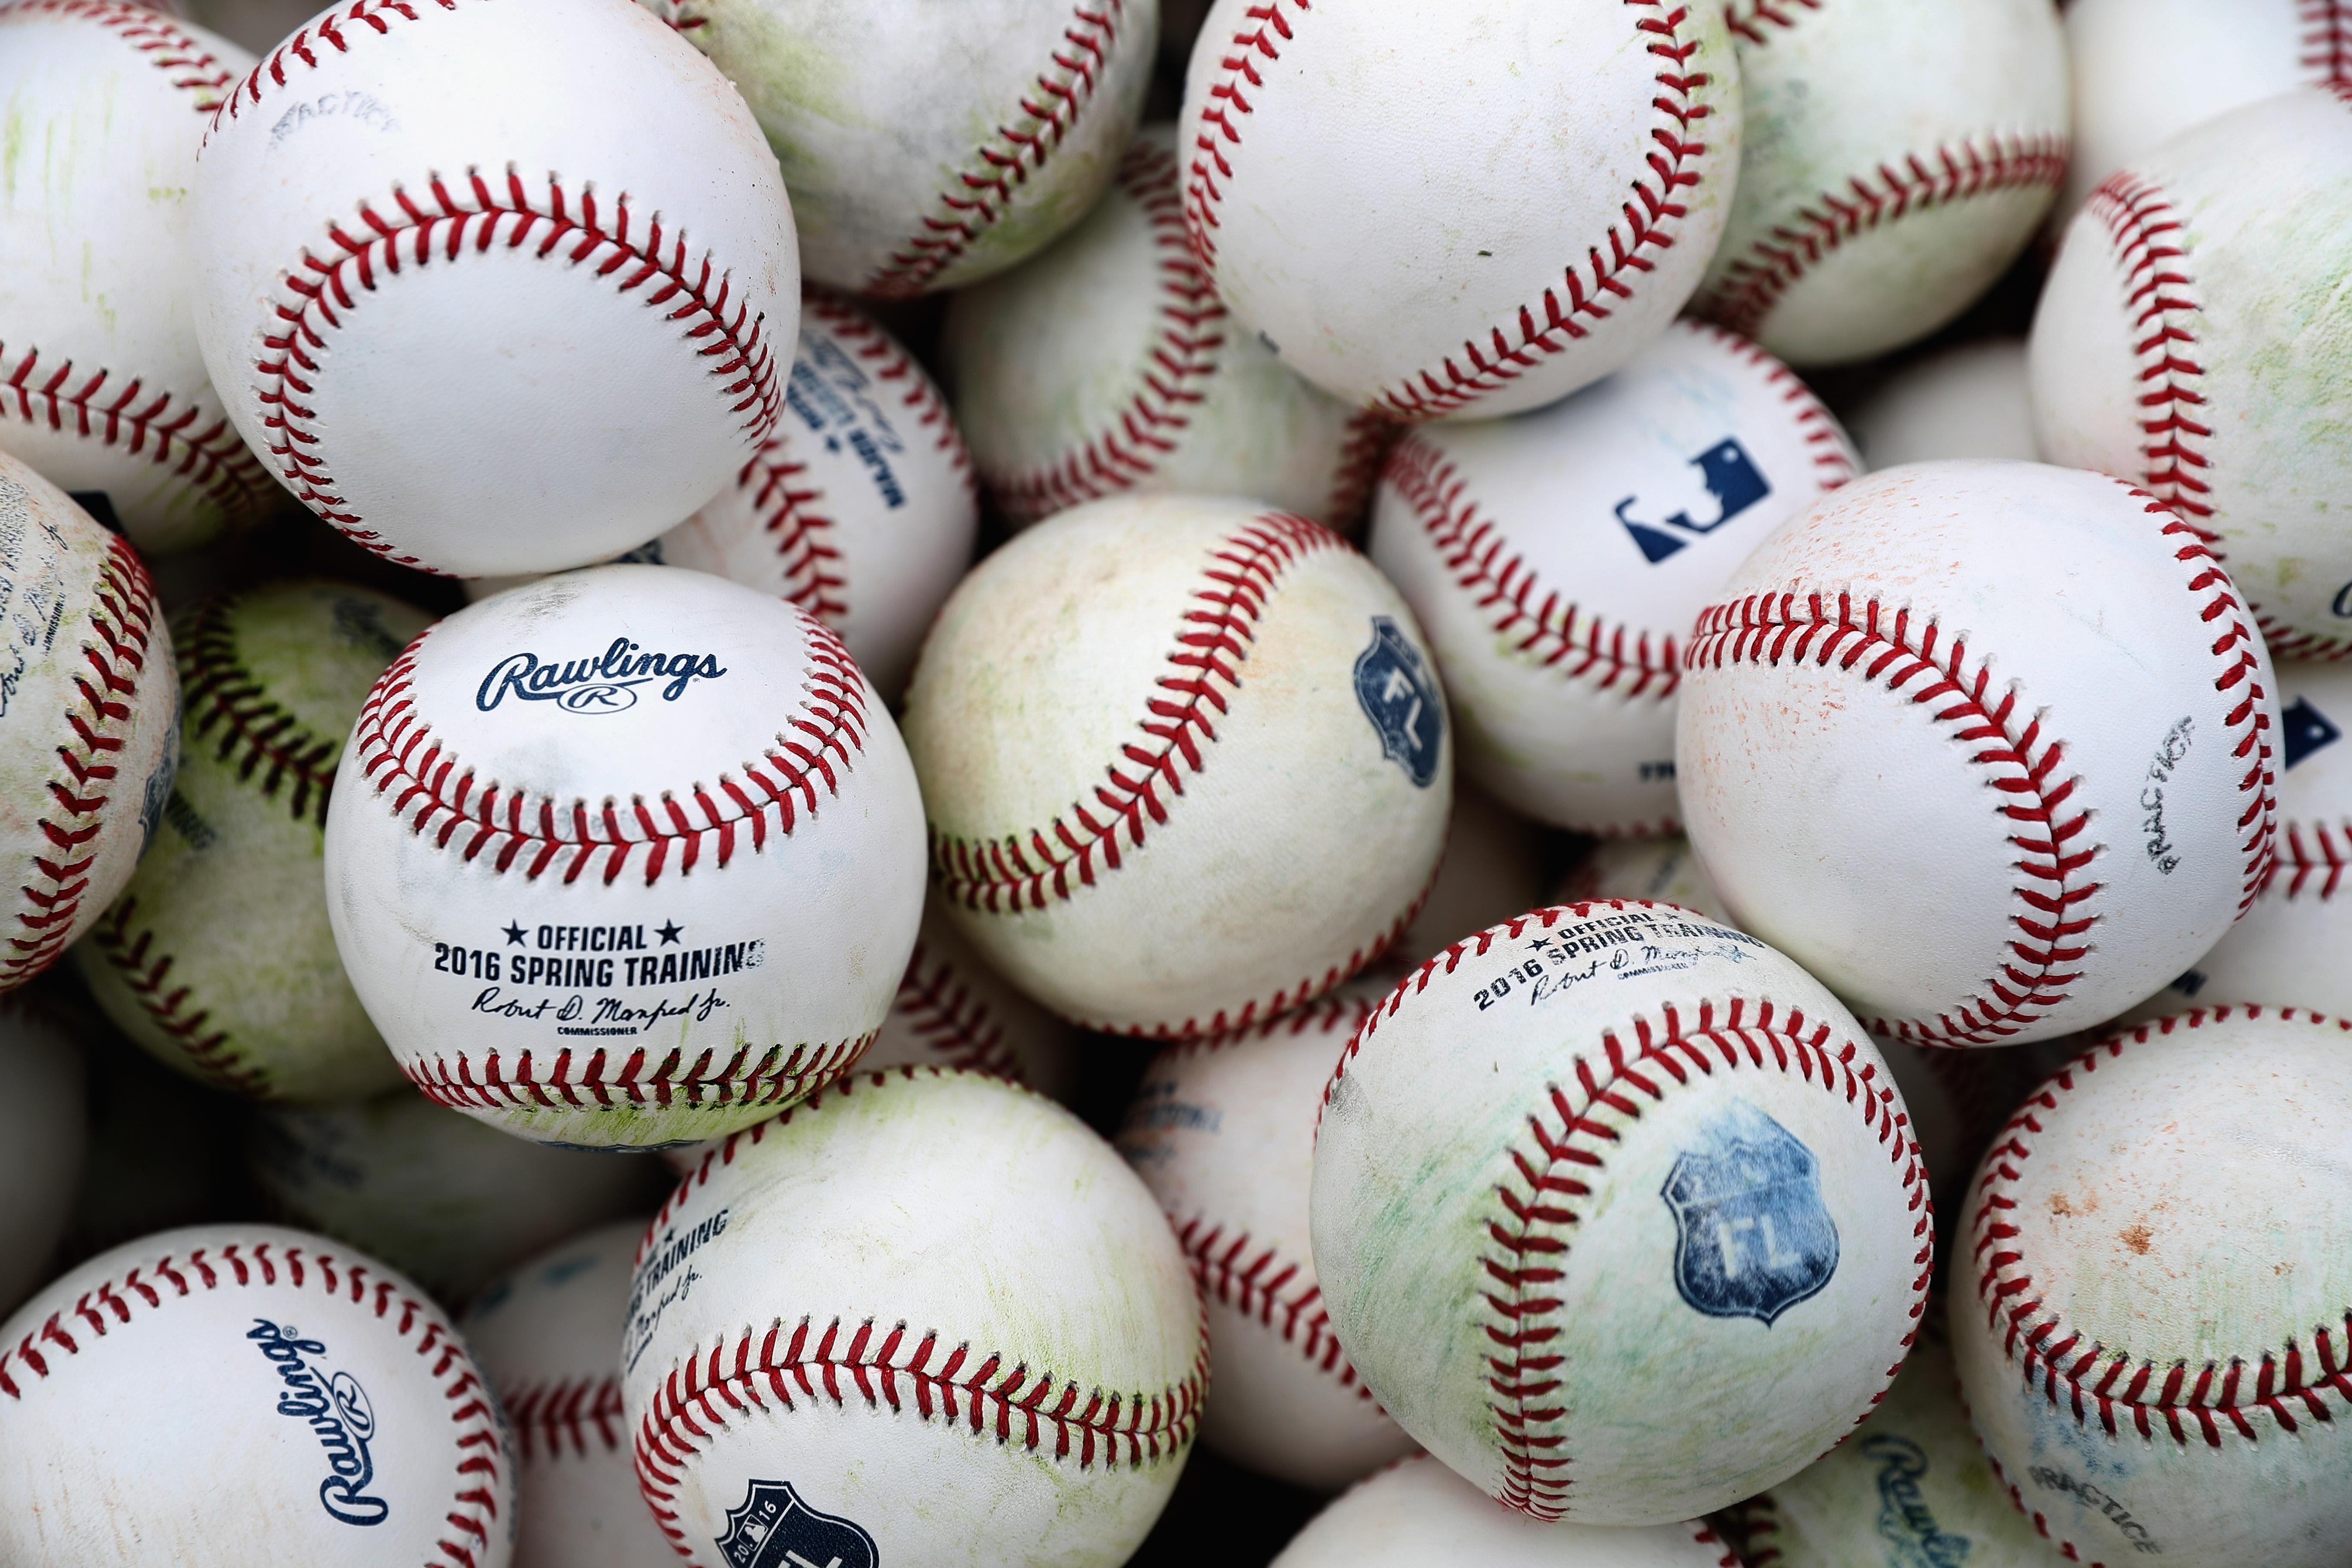 Minnesota Twins v Baltimore Orioles